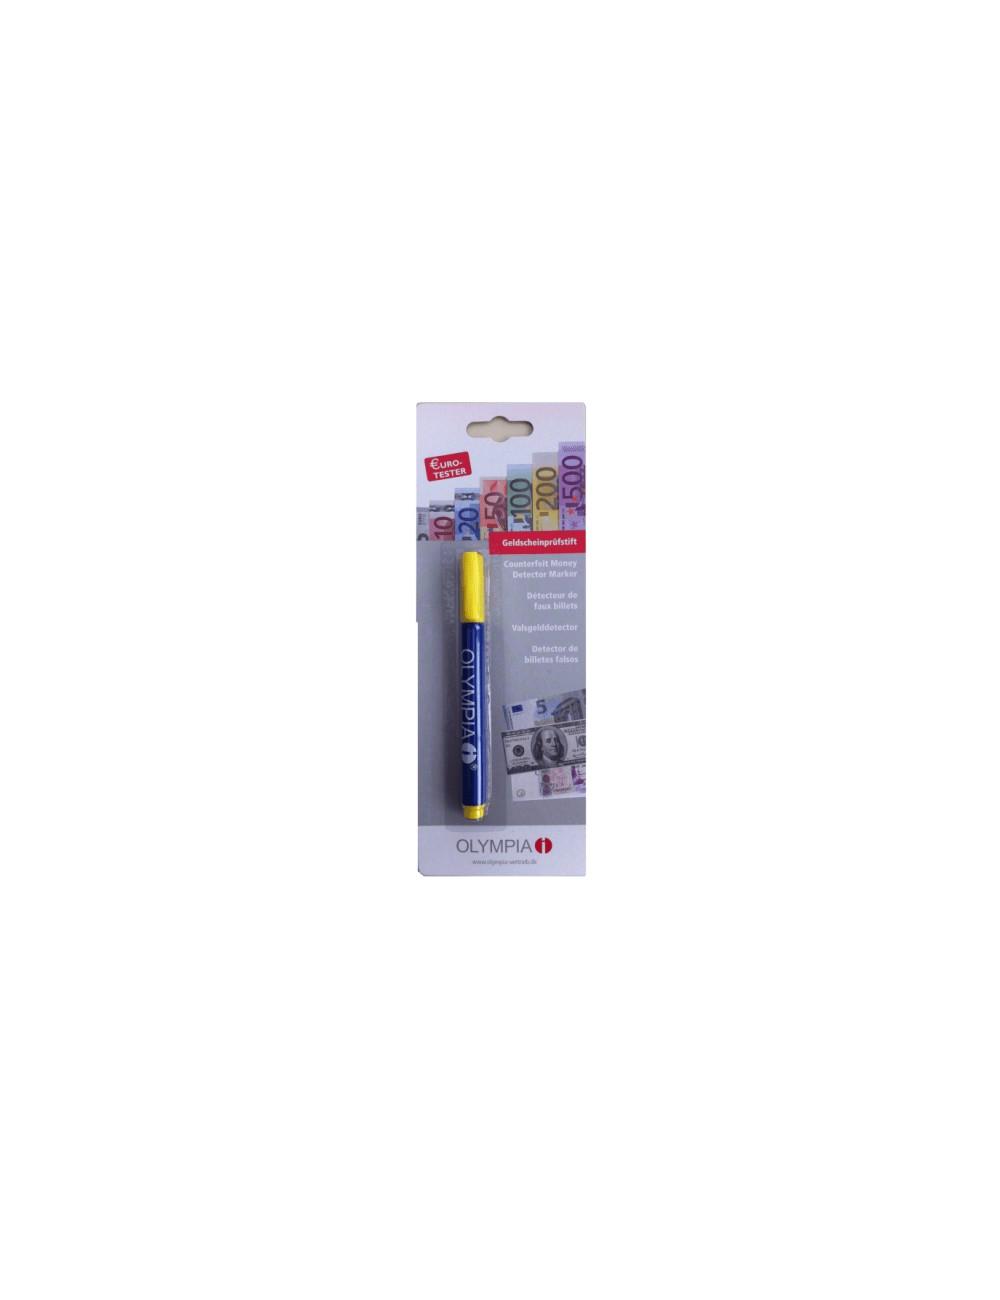 OLYMPIA Στυλό- μαρκαδόρος ανιχνευτής πλαστών χαρτονομισμάτων